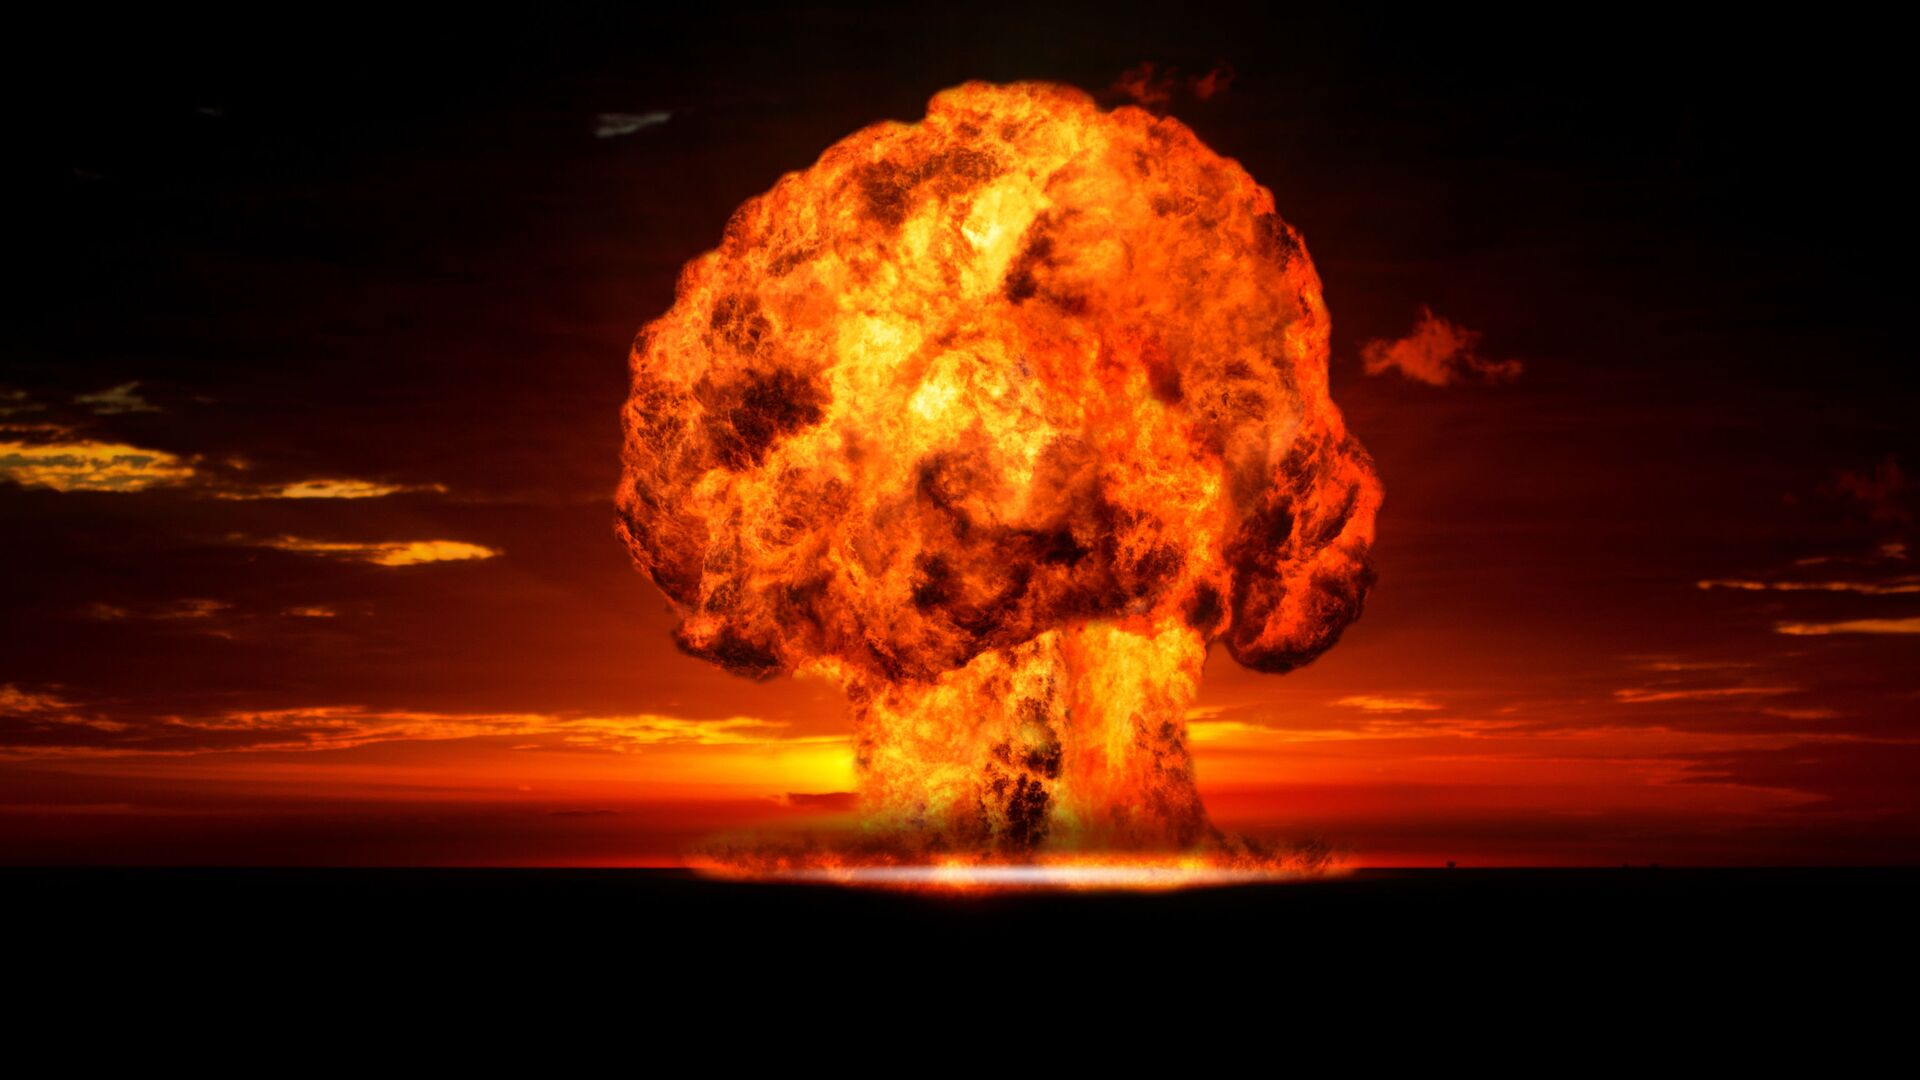 Atomexplosion (Symbolbild) - SNA, 1920, 04.10.2021